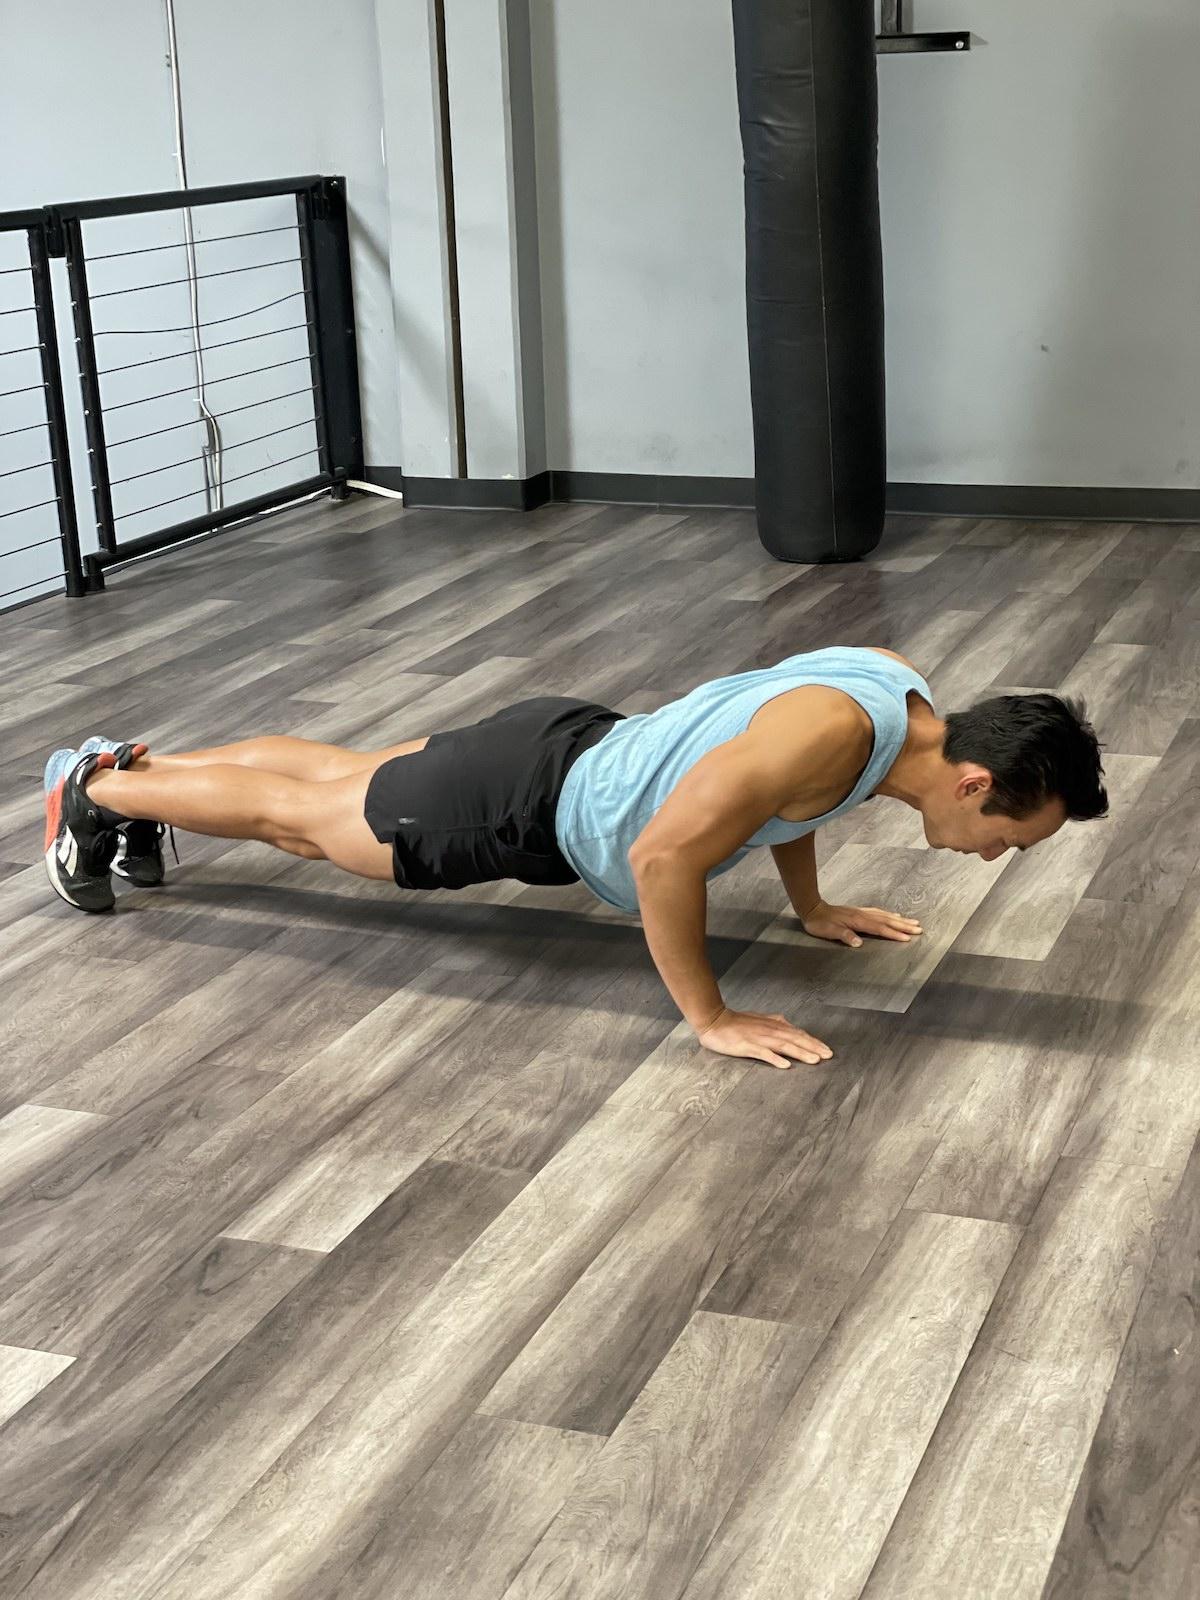 tim liu doing a pushup - poor form